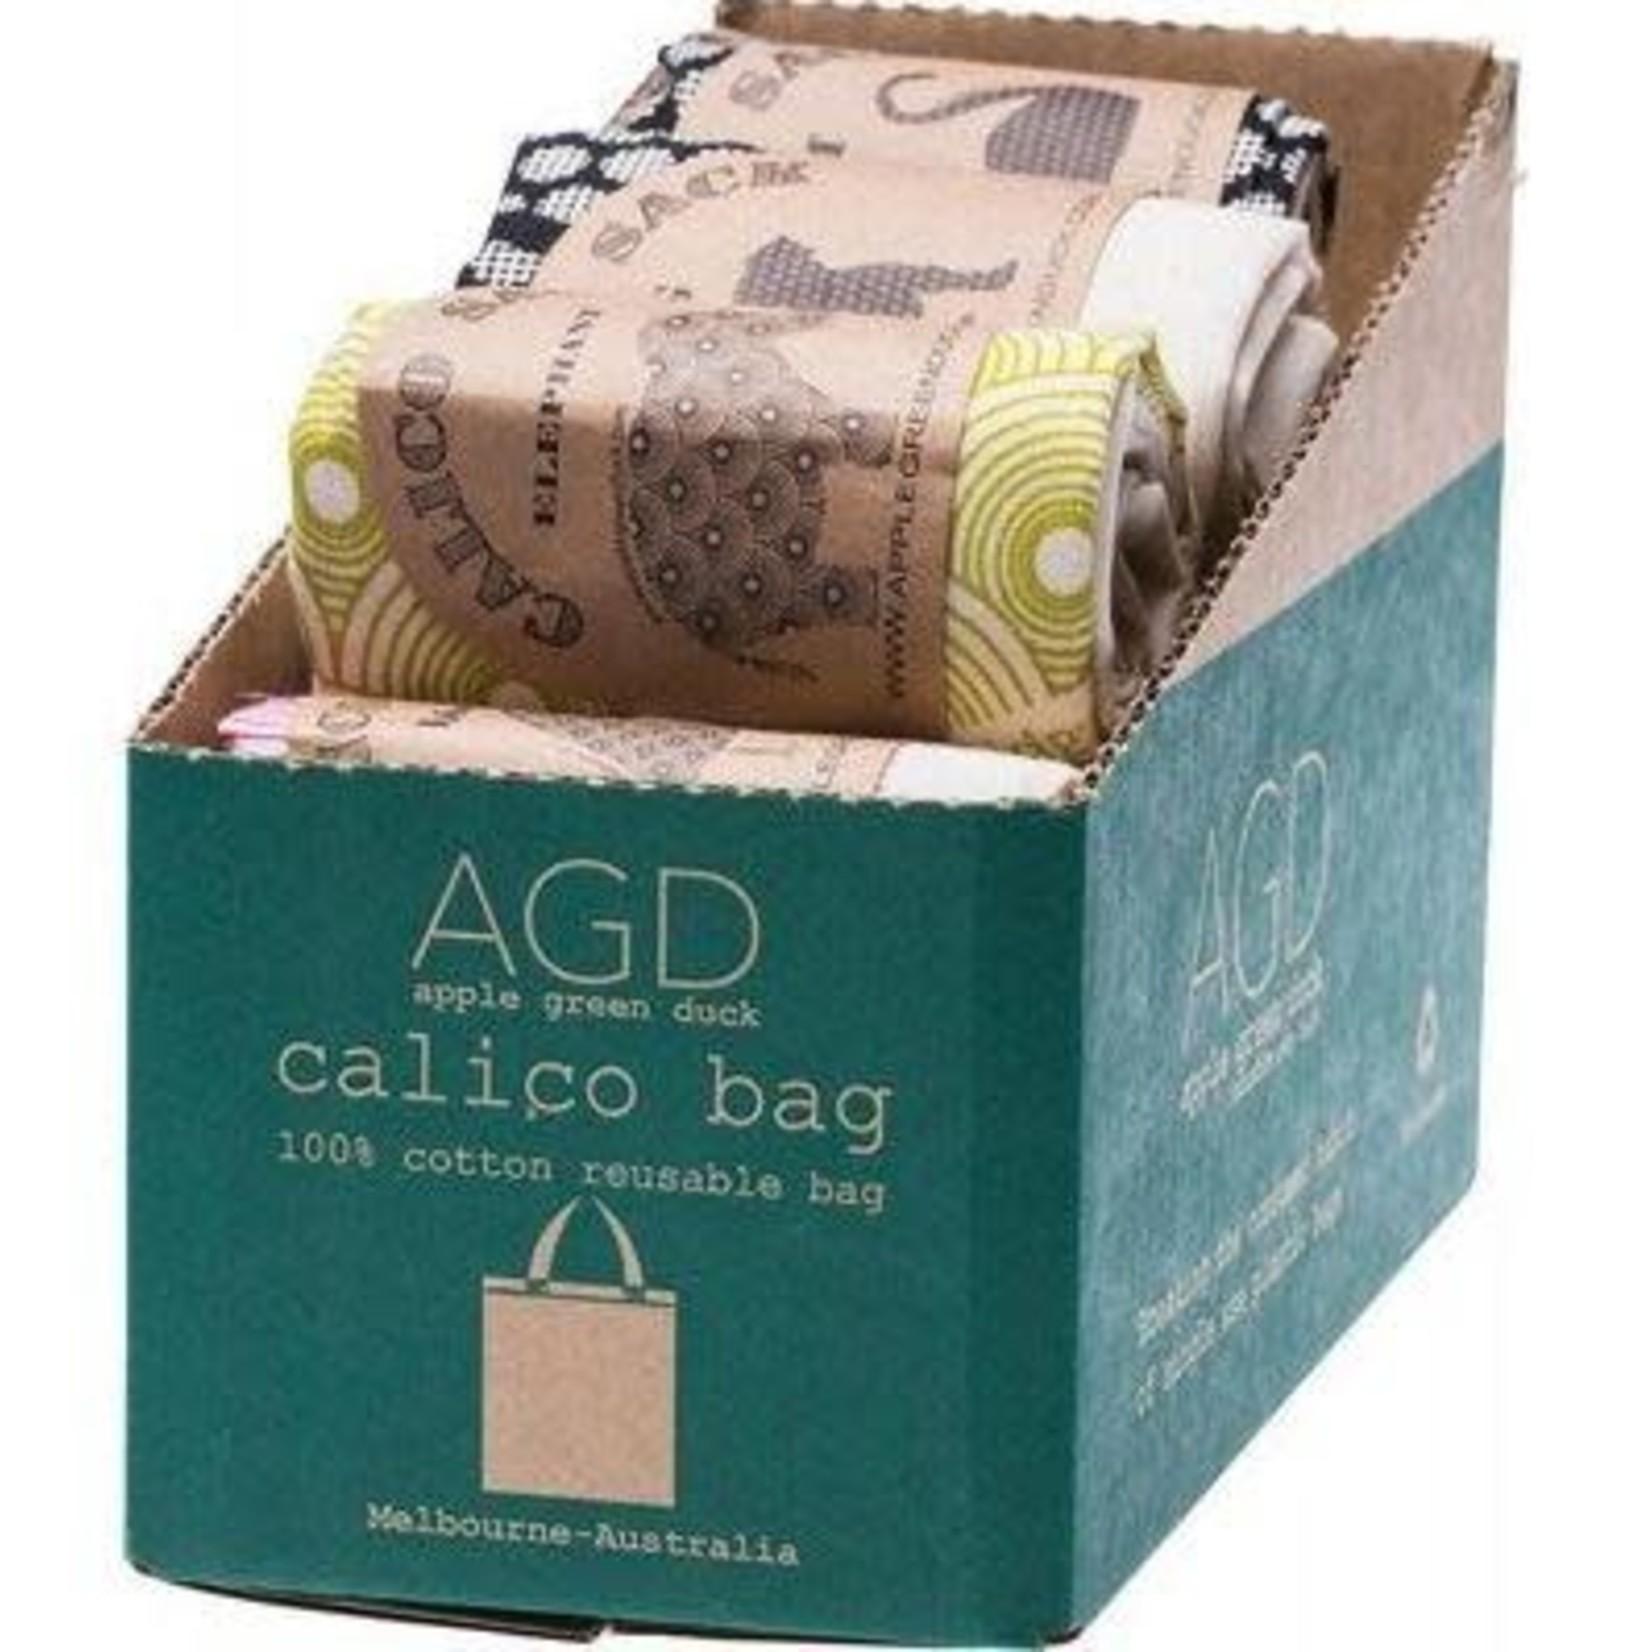 Apple Green Duck Apple Green Duck Calico Bag Animal Design